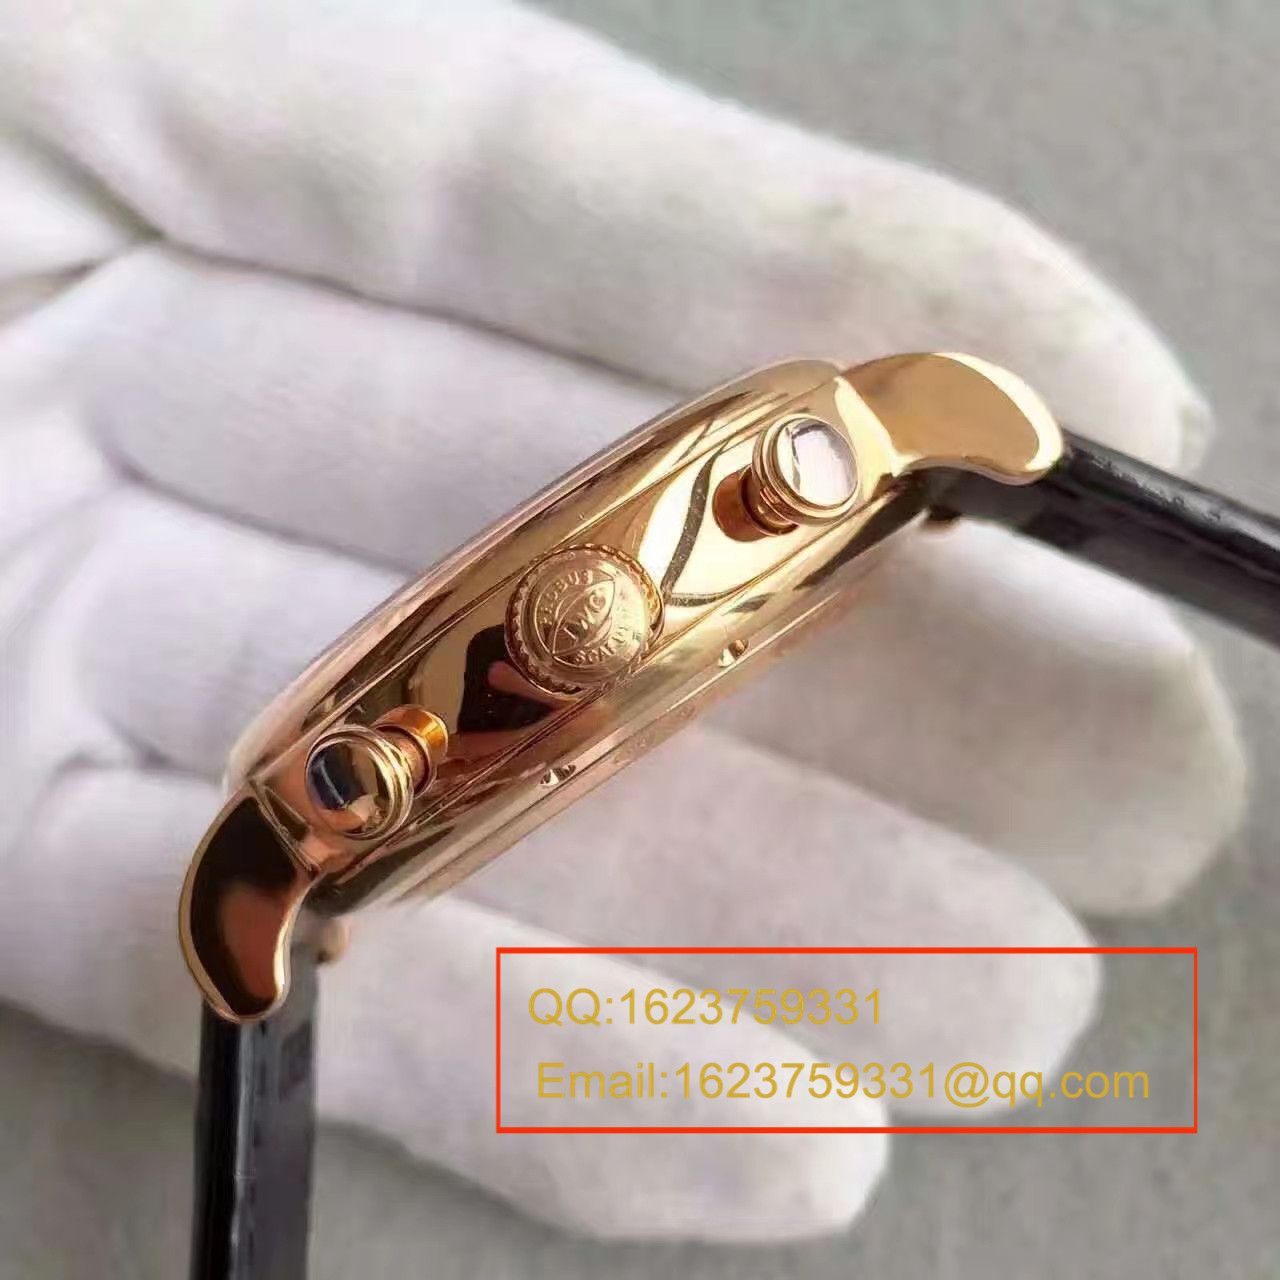 【MK厂一比一复刻手表】万国柏涛菲诺系列IW391021 多功能机械计时腕表 / WG134